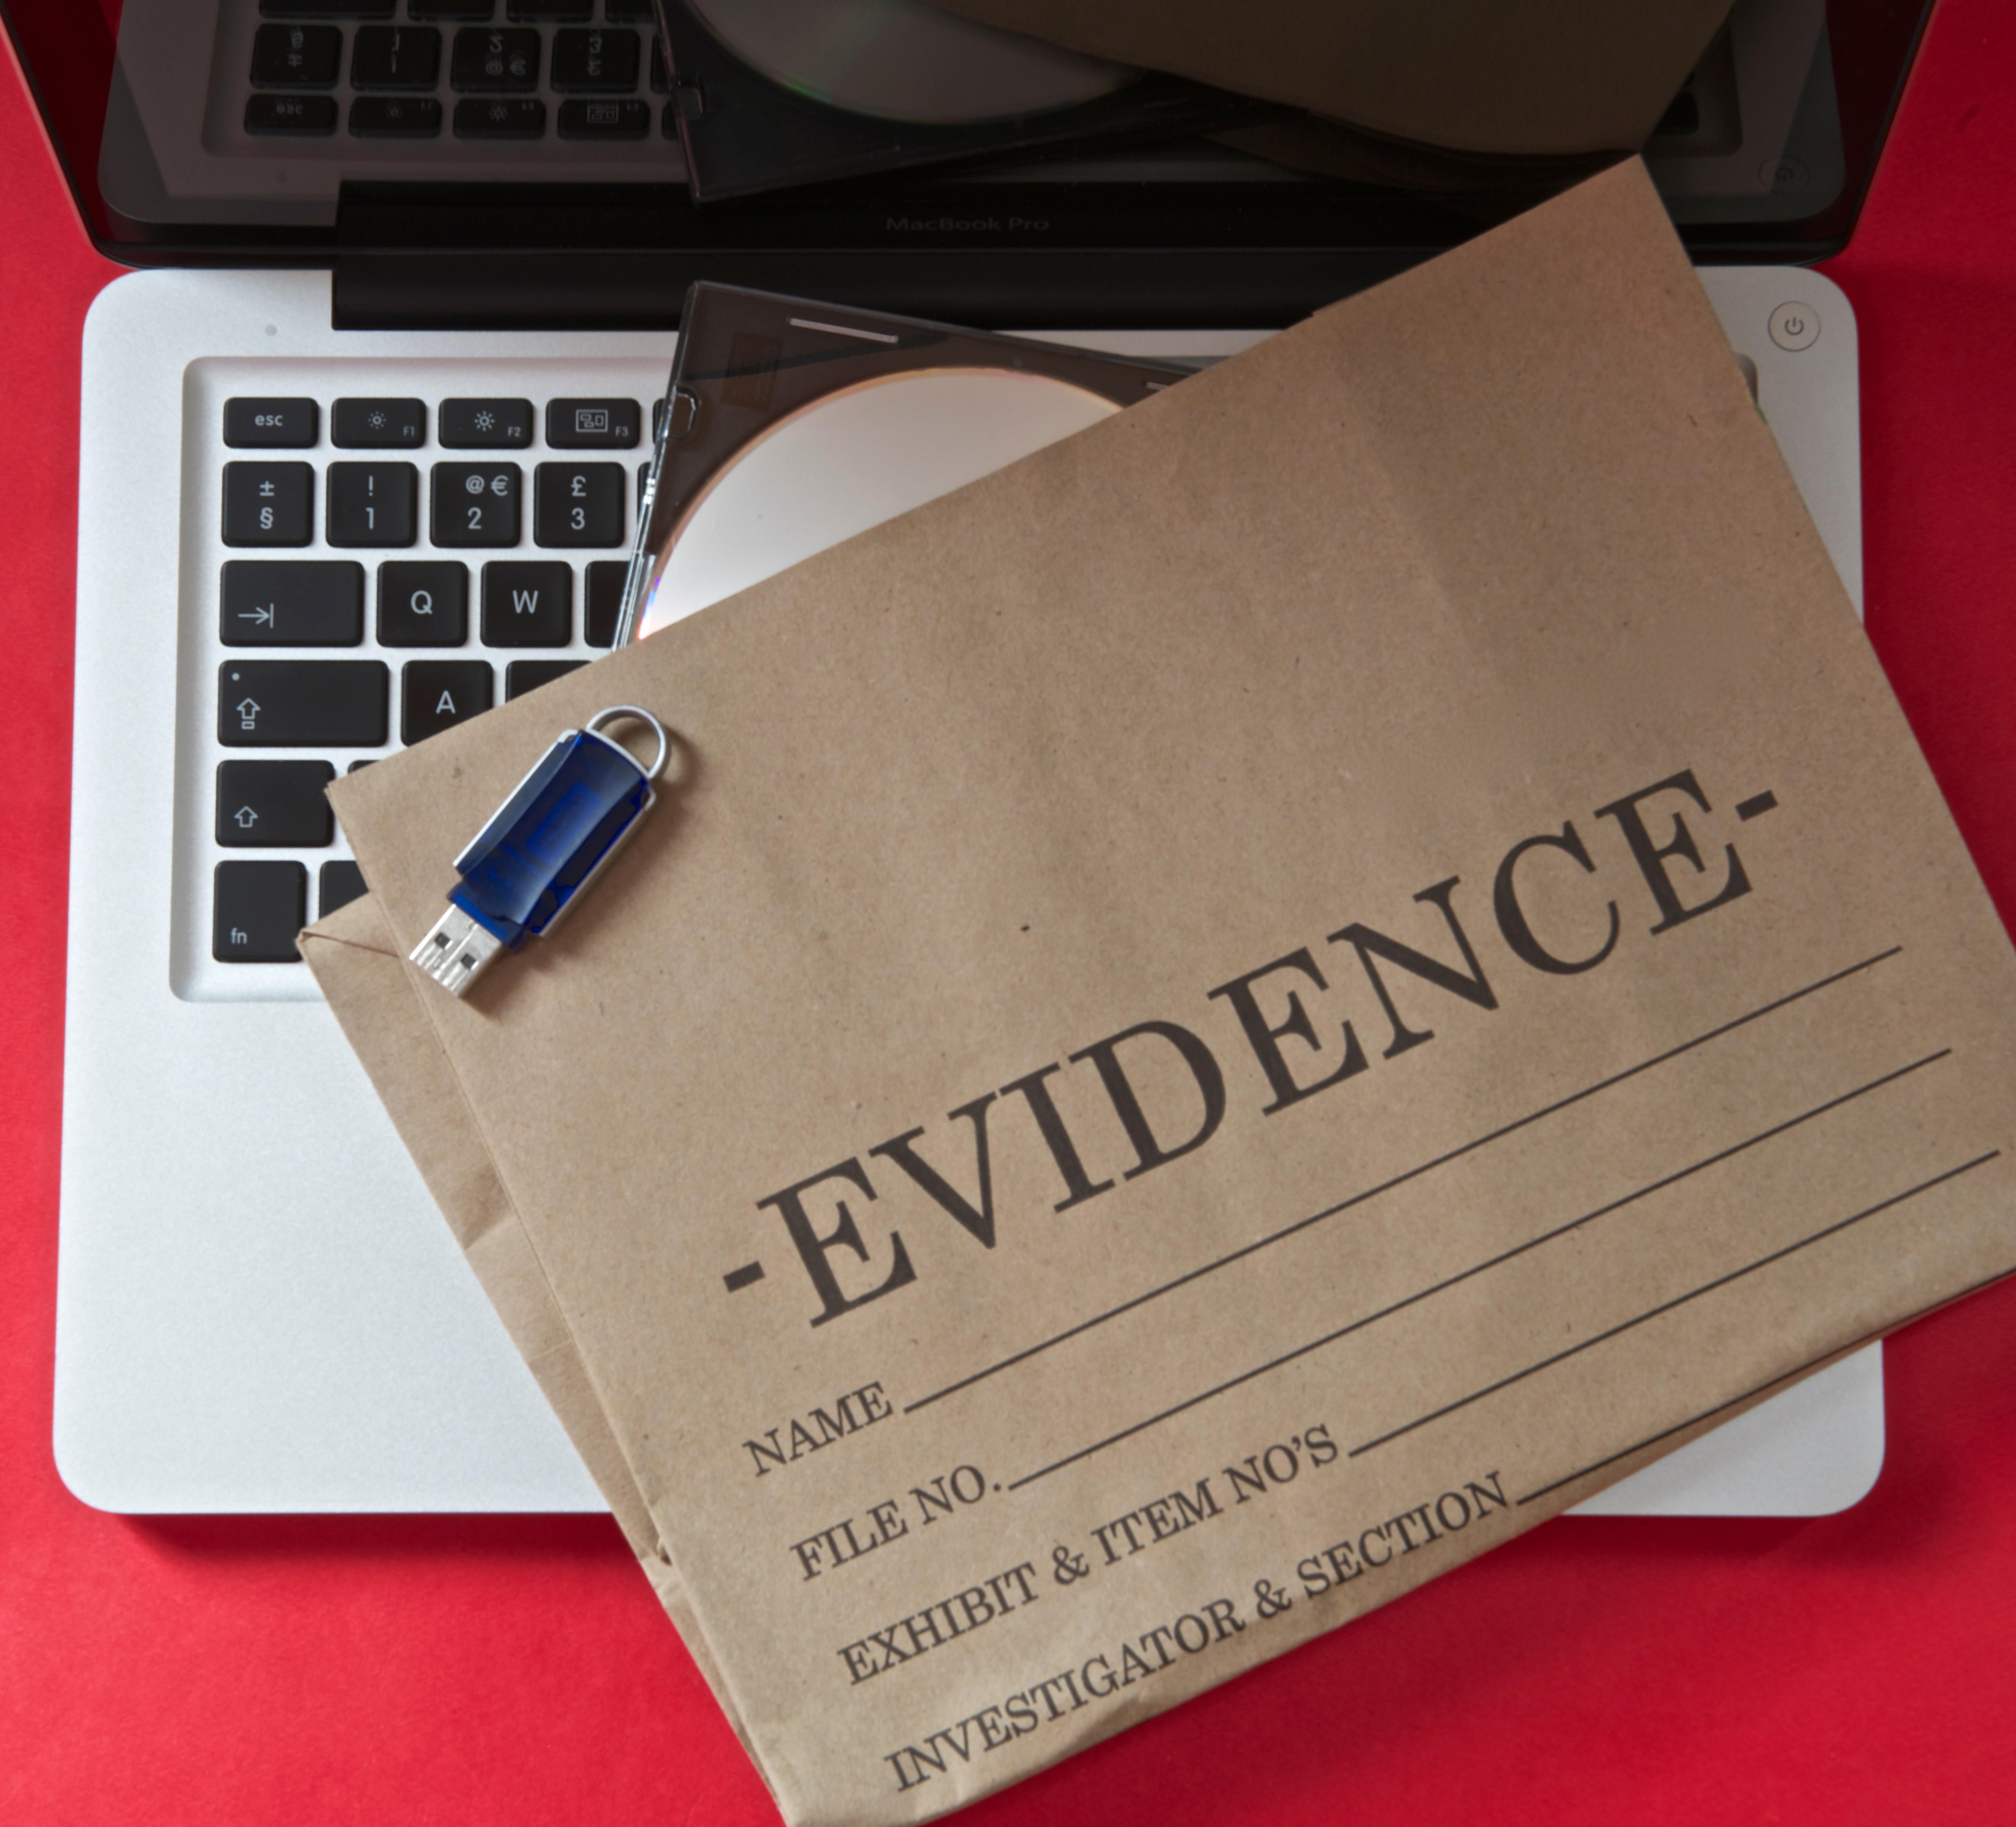 Preserving evidence